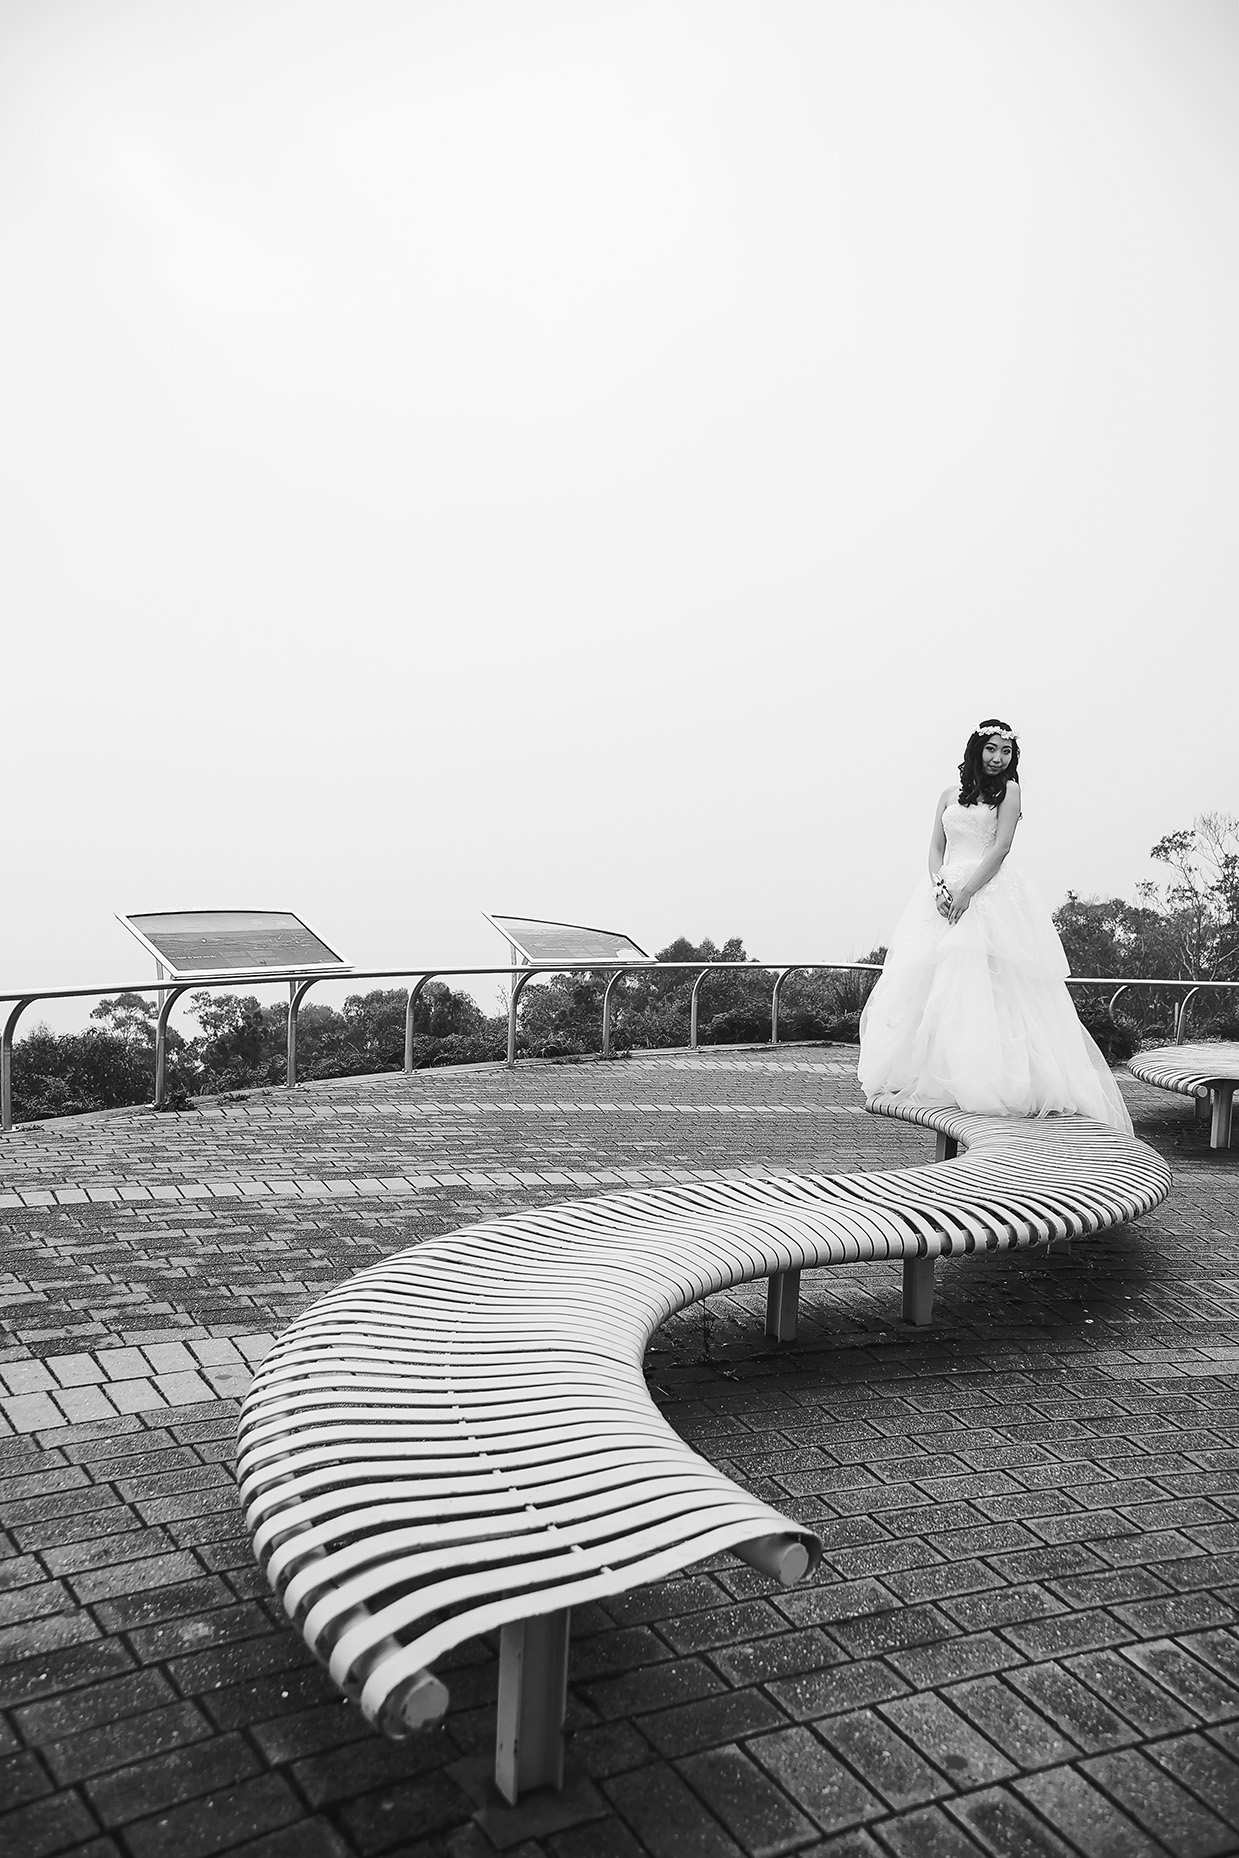 Artistic Black and White Wedding Photo 1